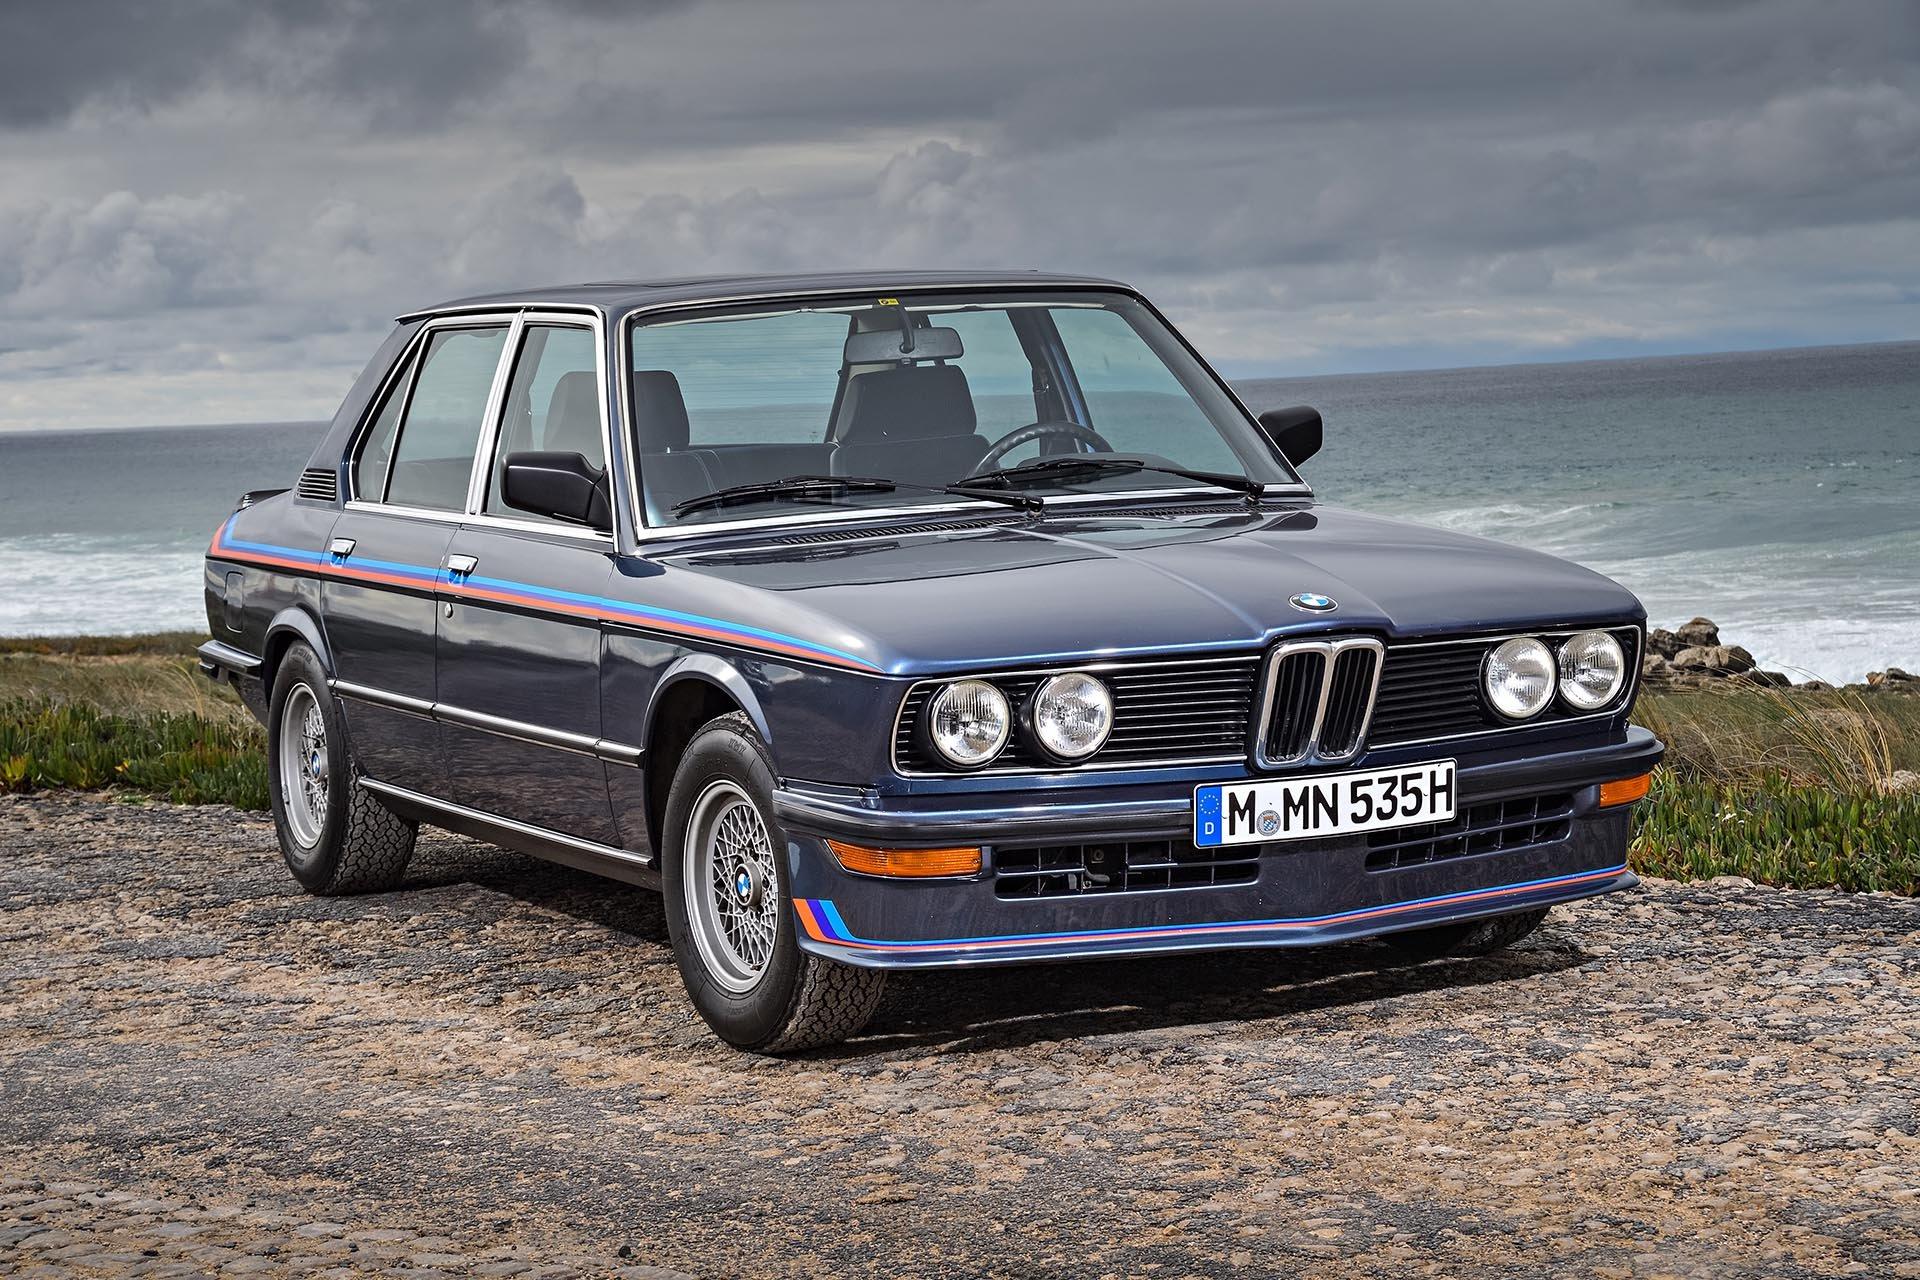 05_BMW M535i front